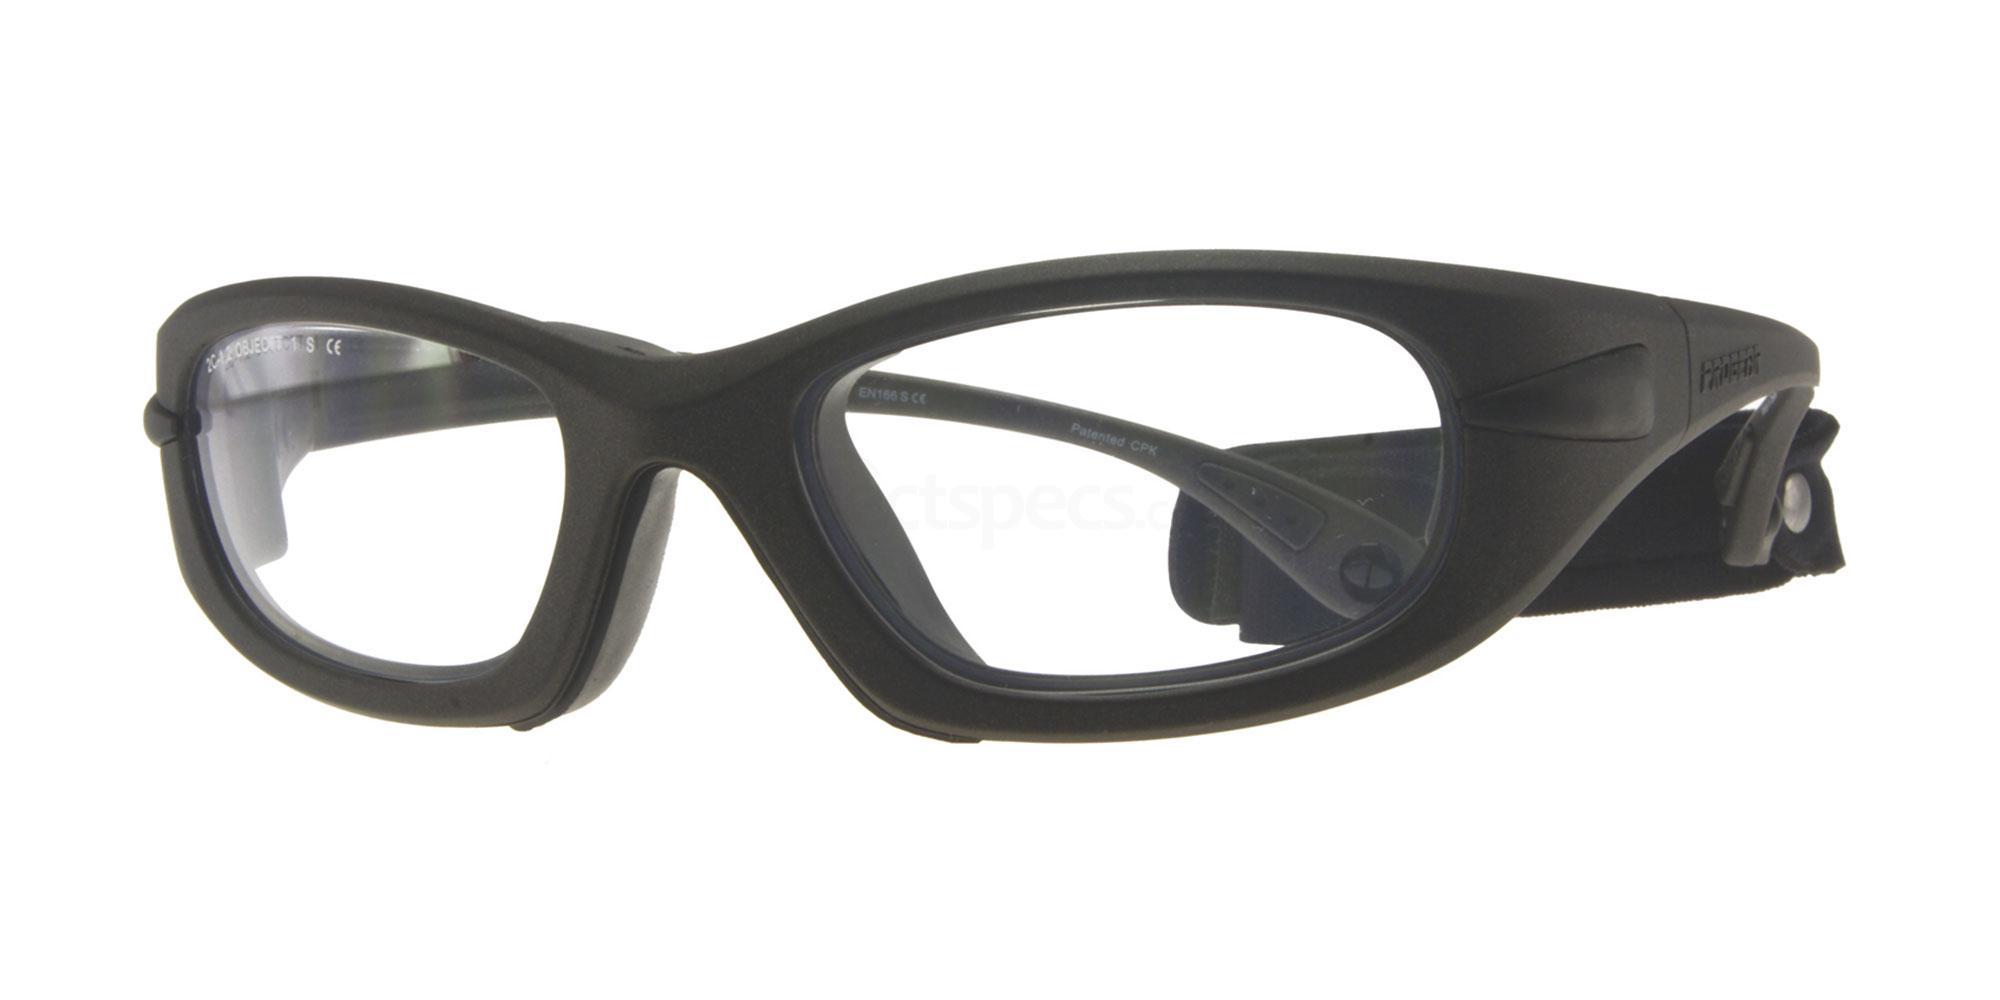 Graphite Progear EG-XL 1040 Accessories, Sports Eyewear